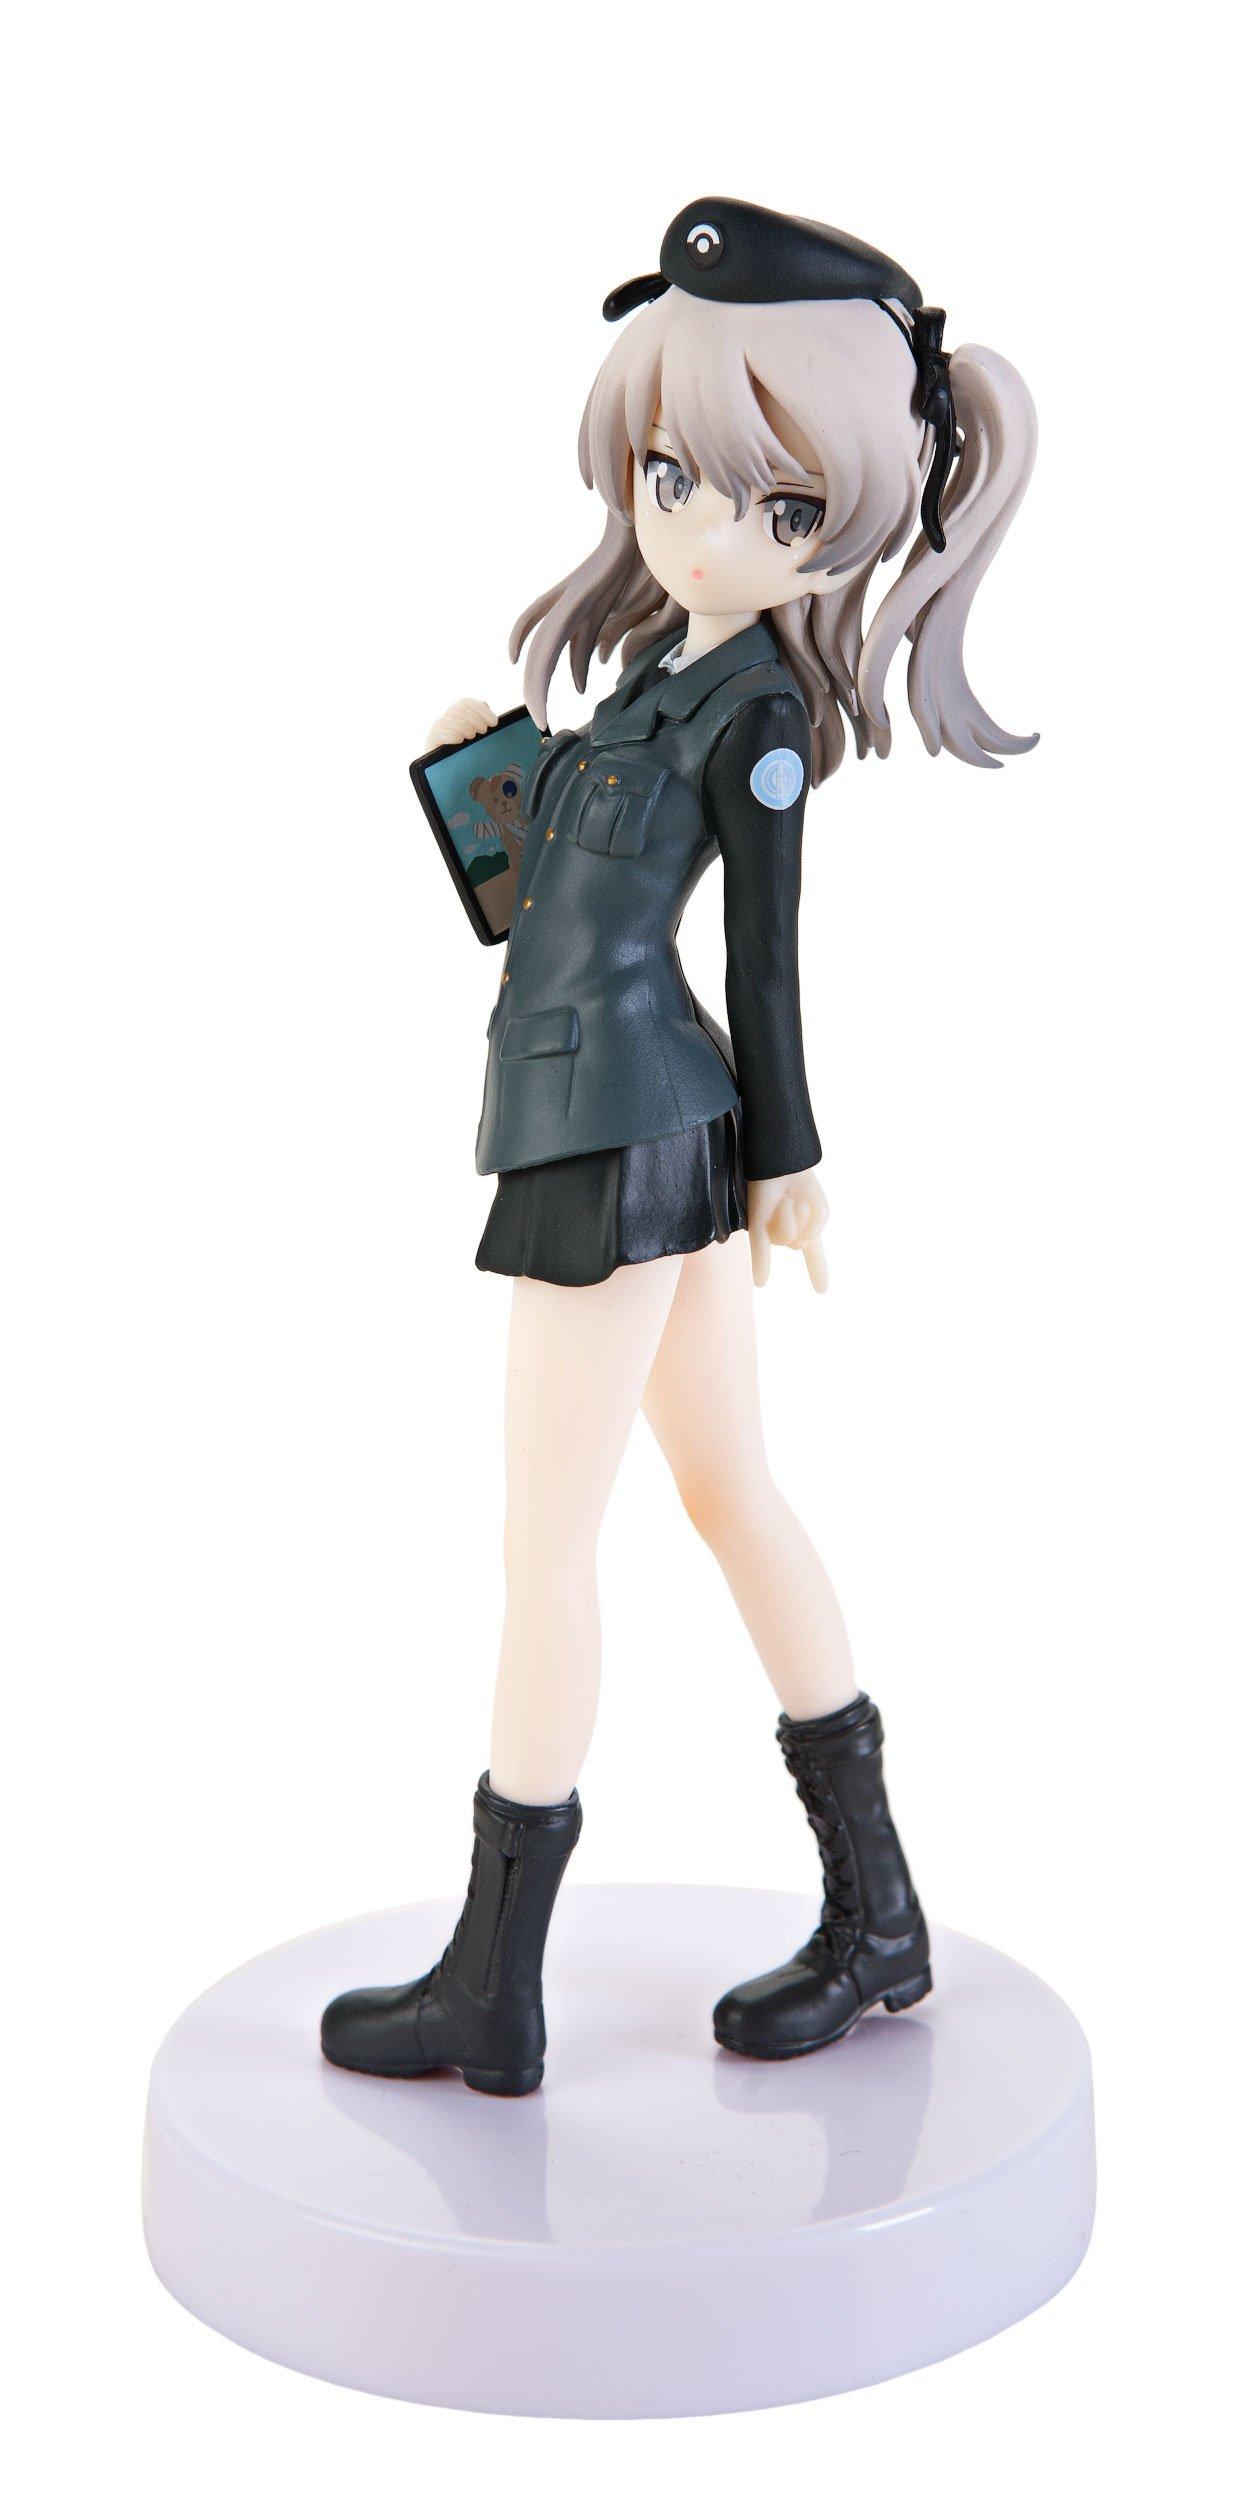 Furyu 6.2'' Girls Und Panzer: Alice Shimada Special Figure